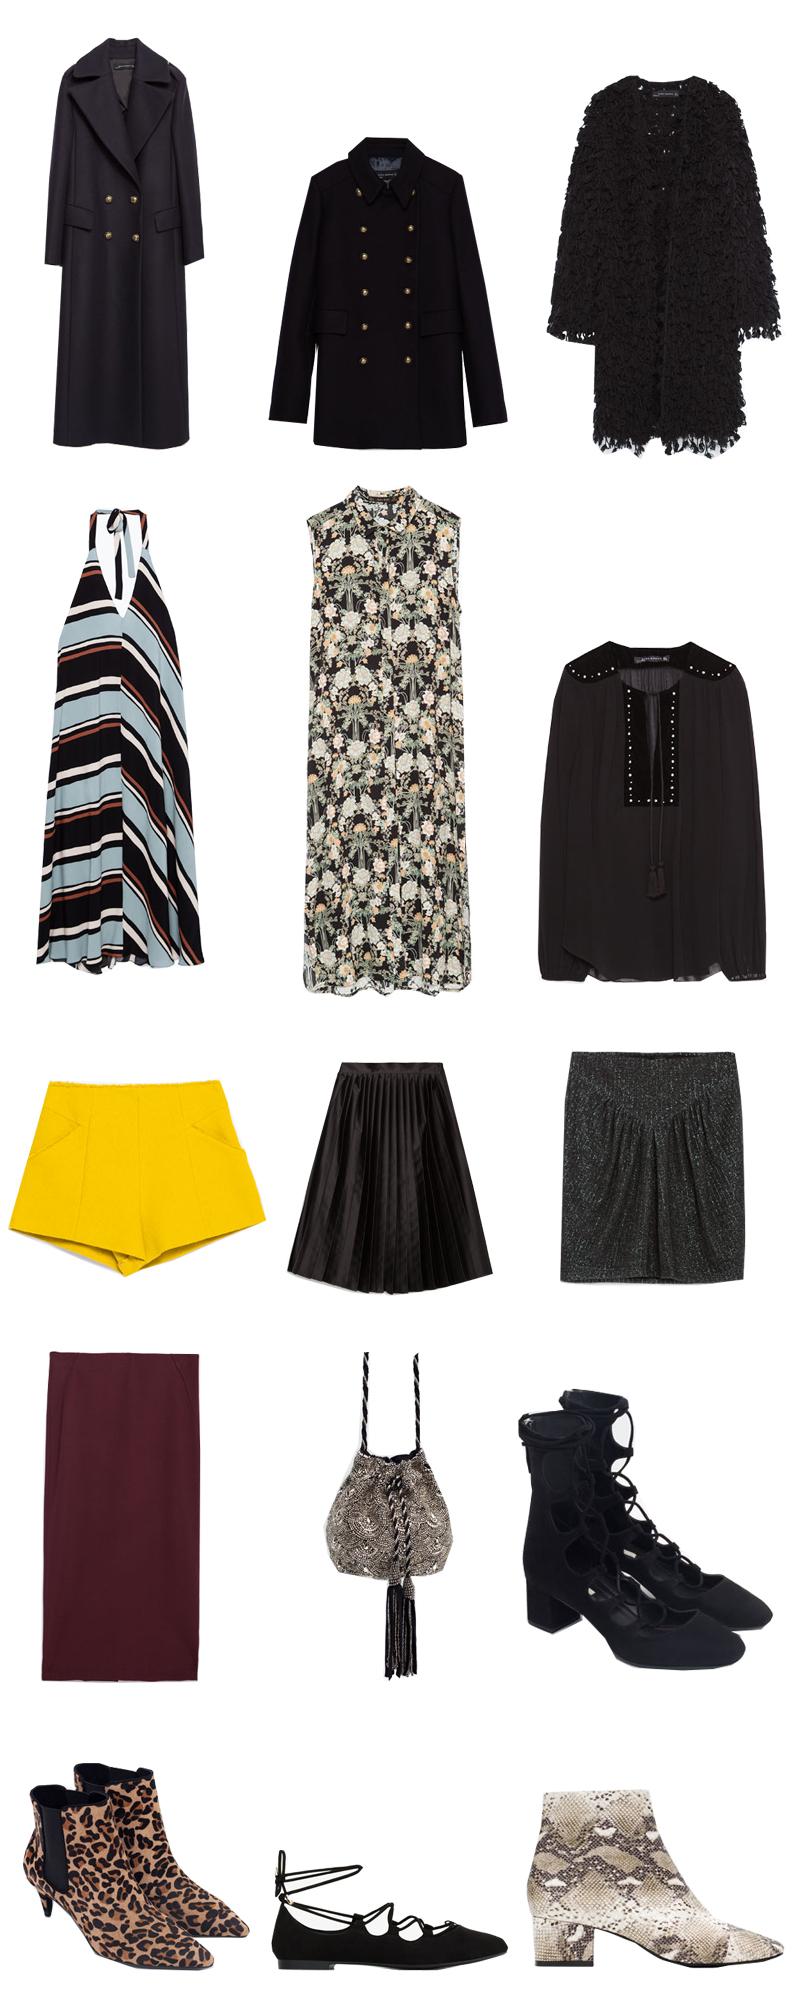 shopping selection